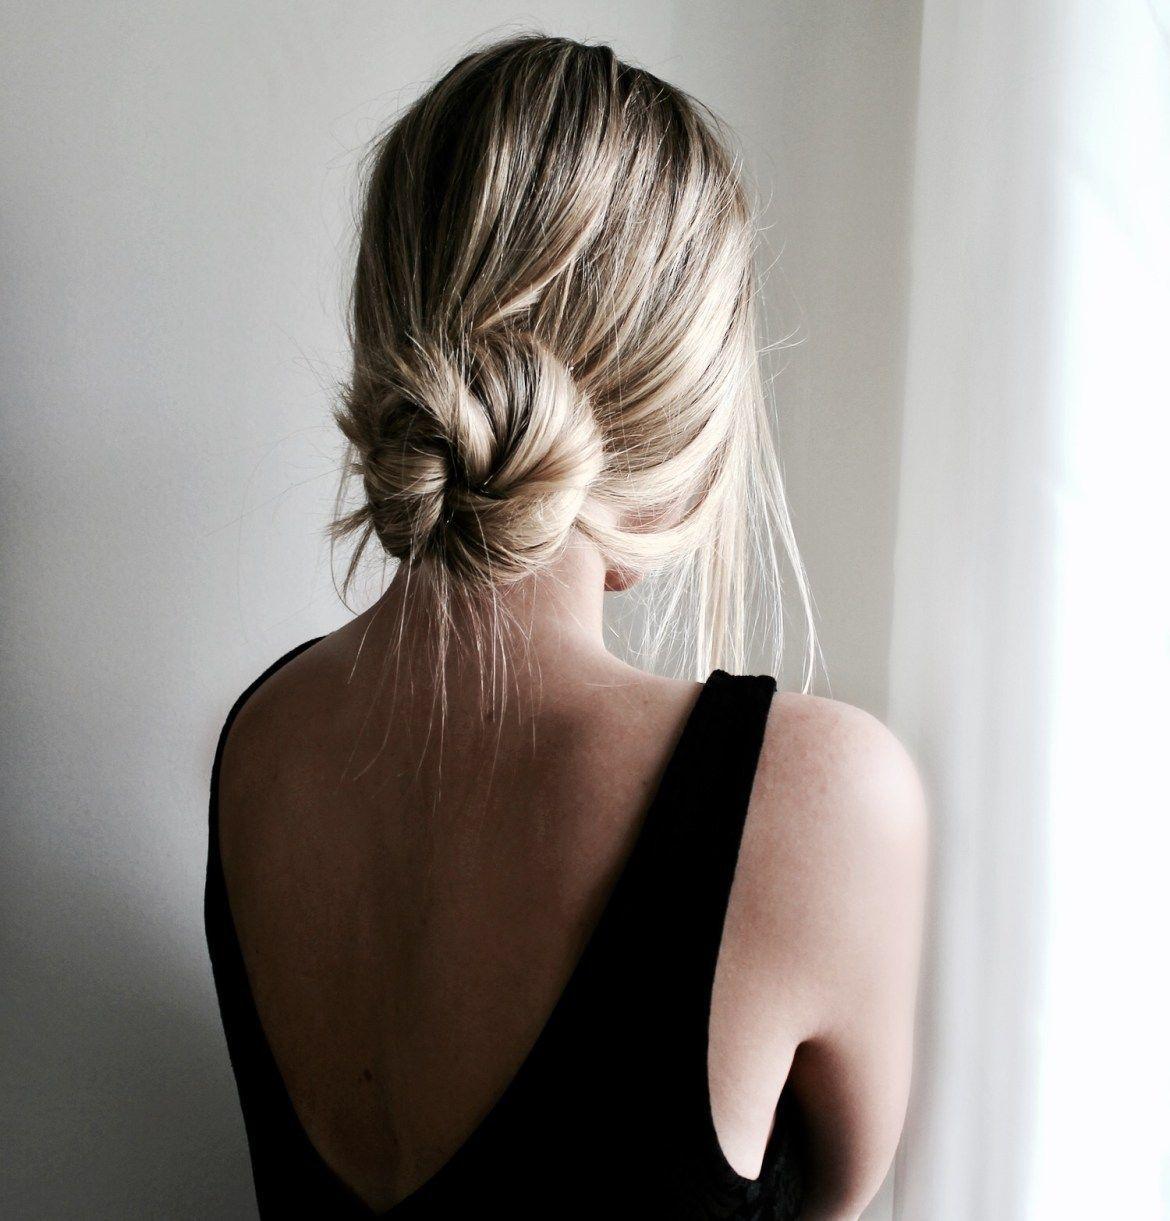 Sundays In A Messy Bun In 2020 Easy Bun Hairstyles Medium Hair Styles Low Bun Hairstyles